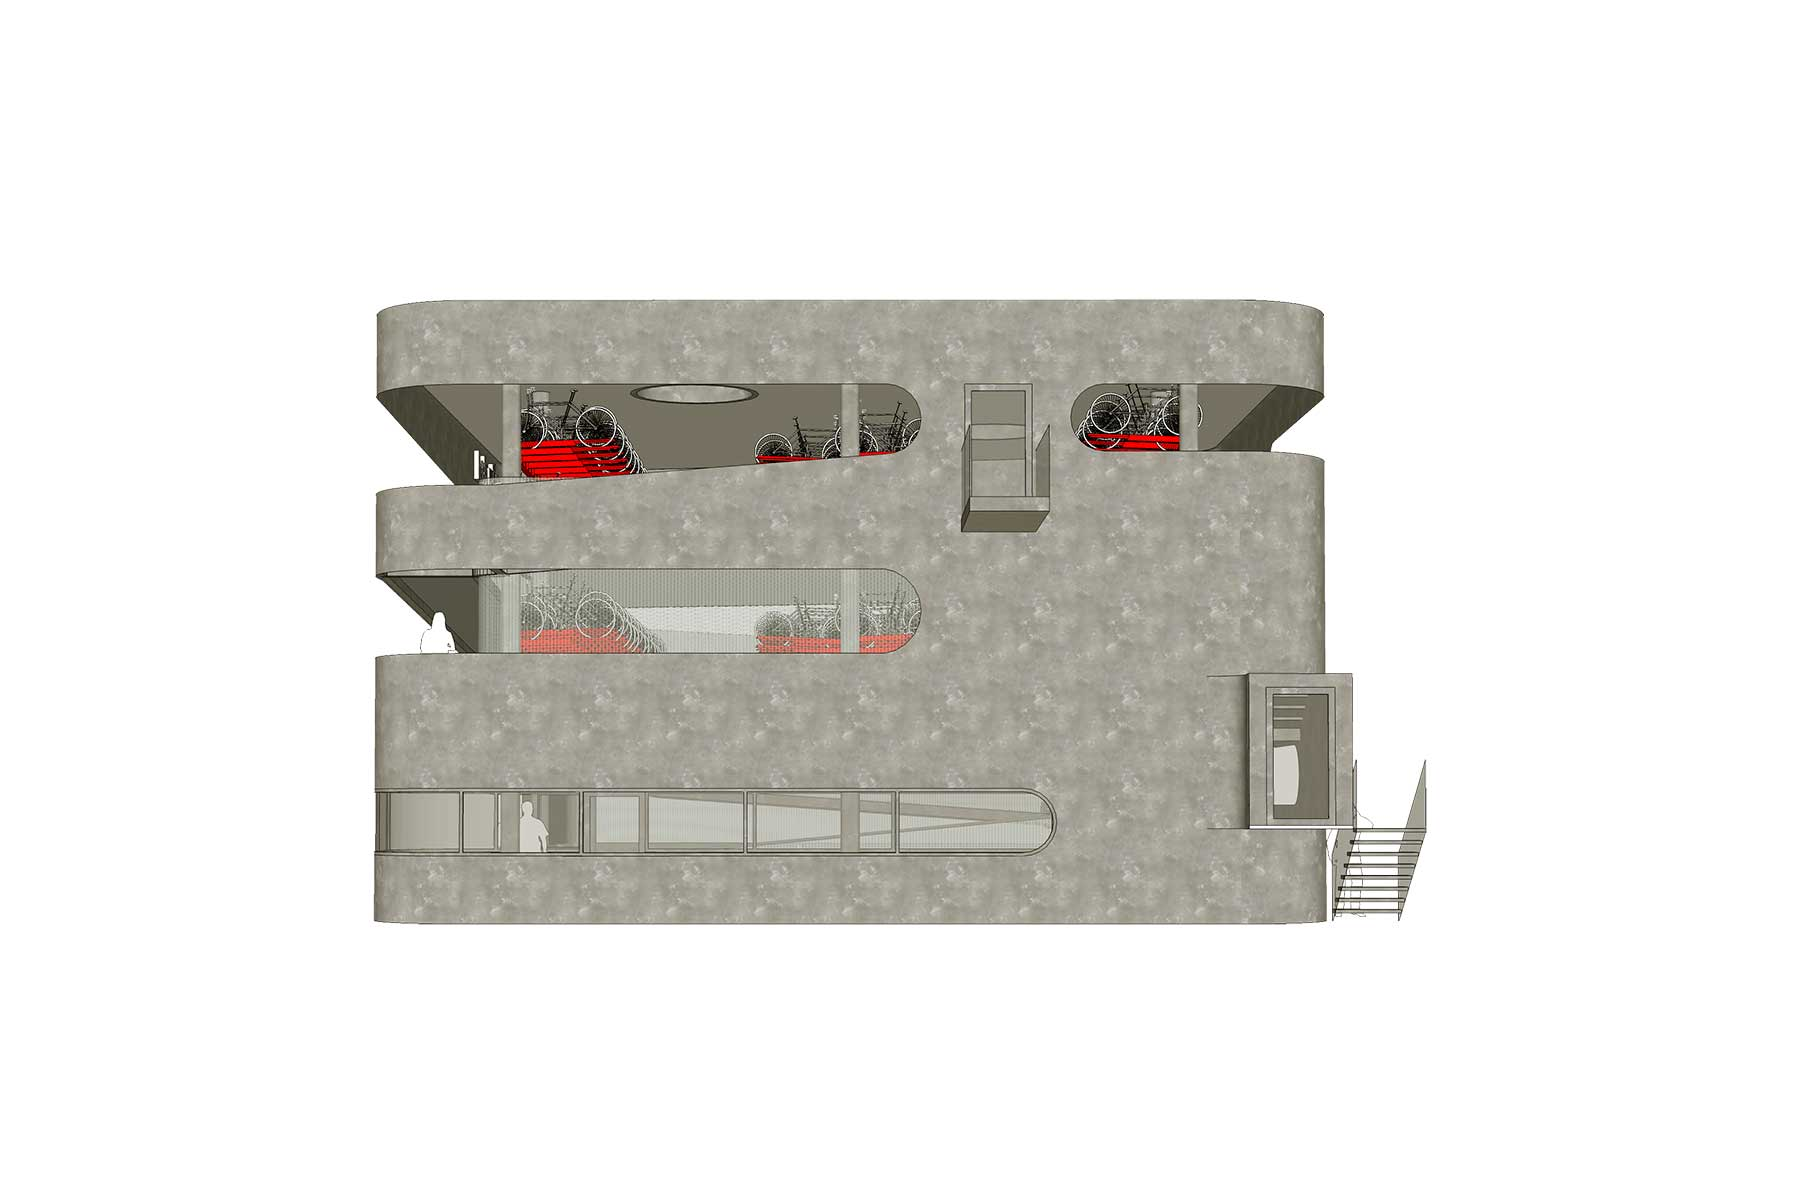 8A-Architecten-city-stal-nieuwegein-15